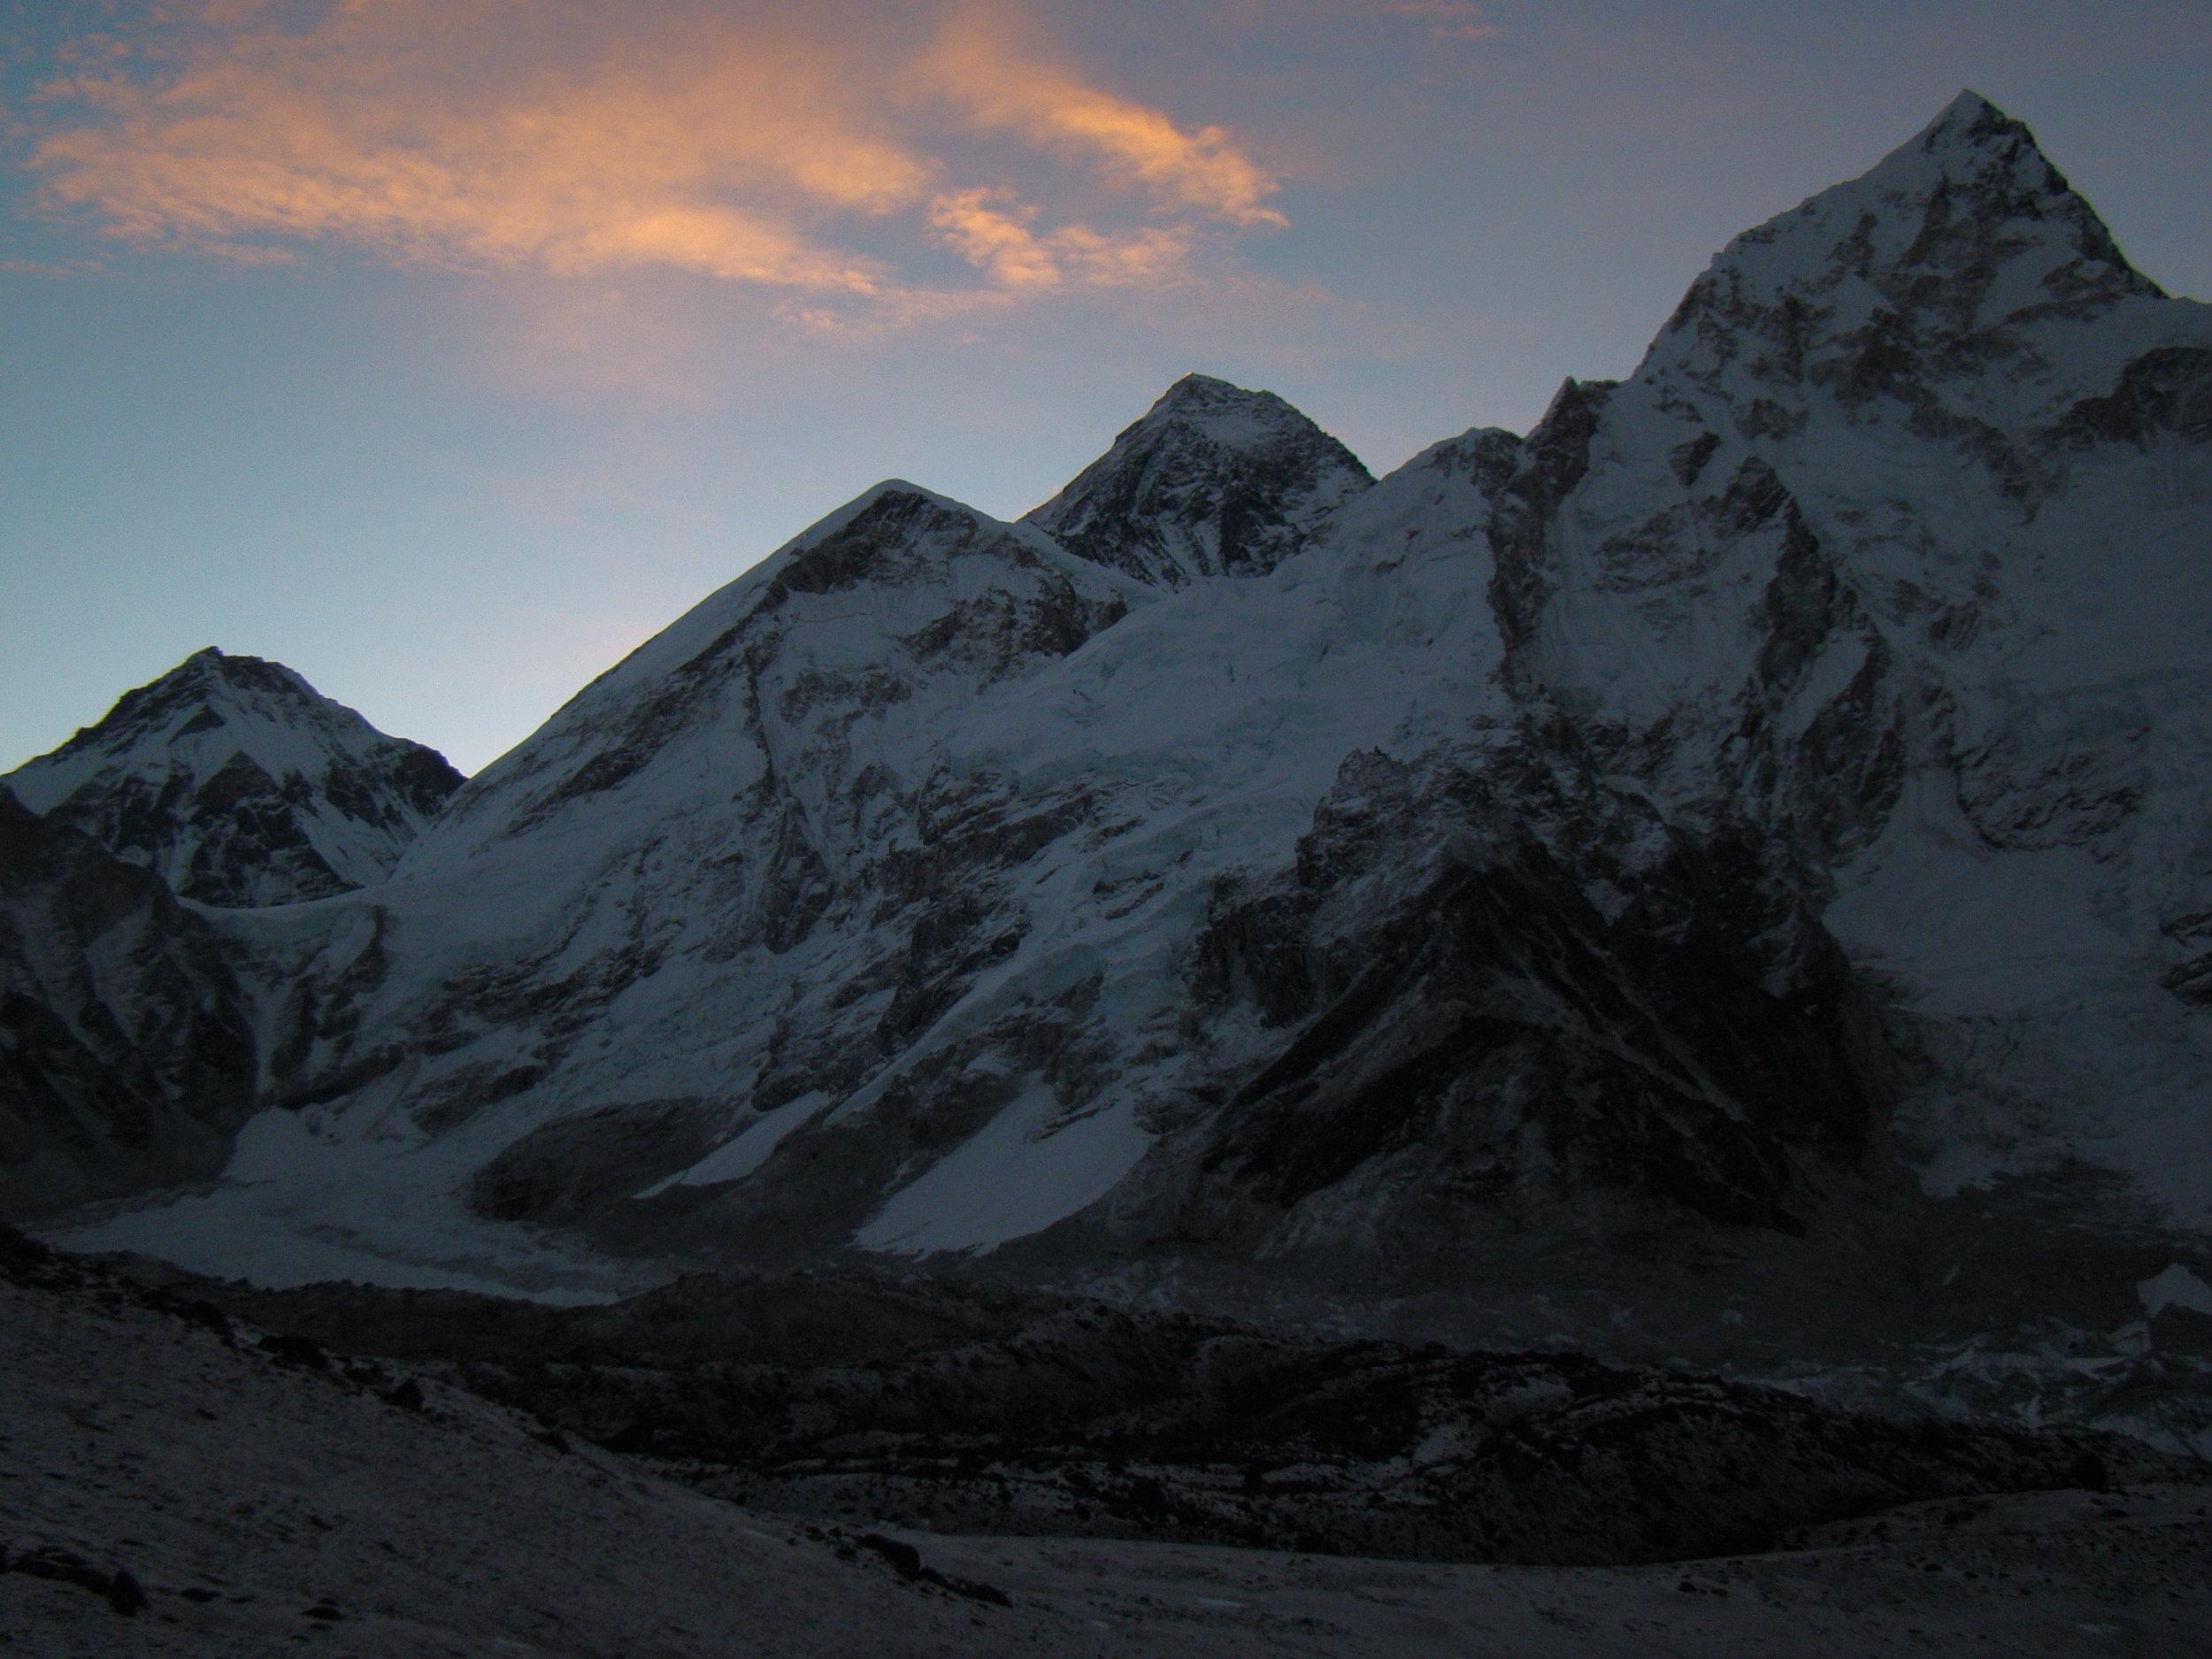 Everest behind Nuptse and next to Lhotse view from Kalar Pathar - Photo by Filip Lhota